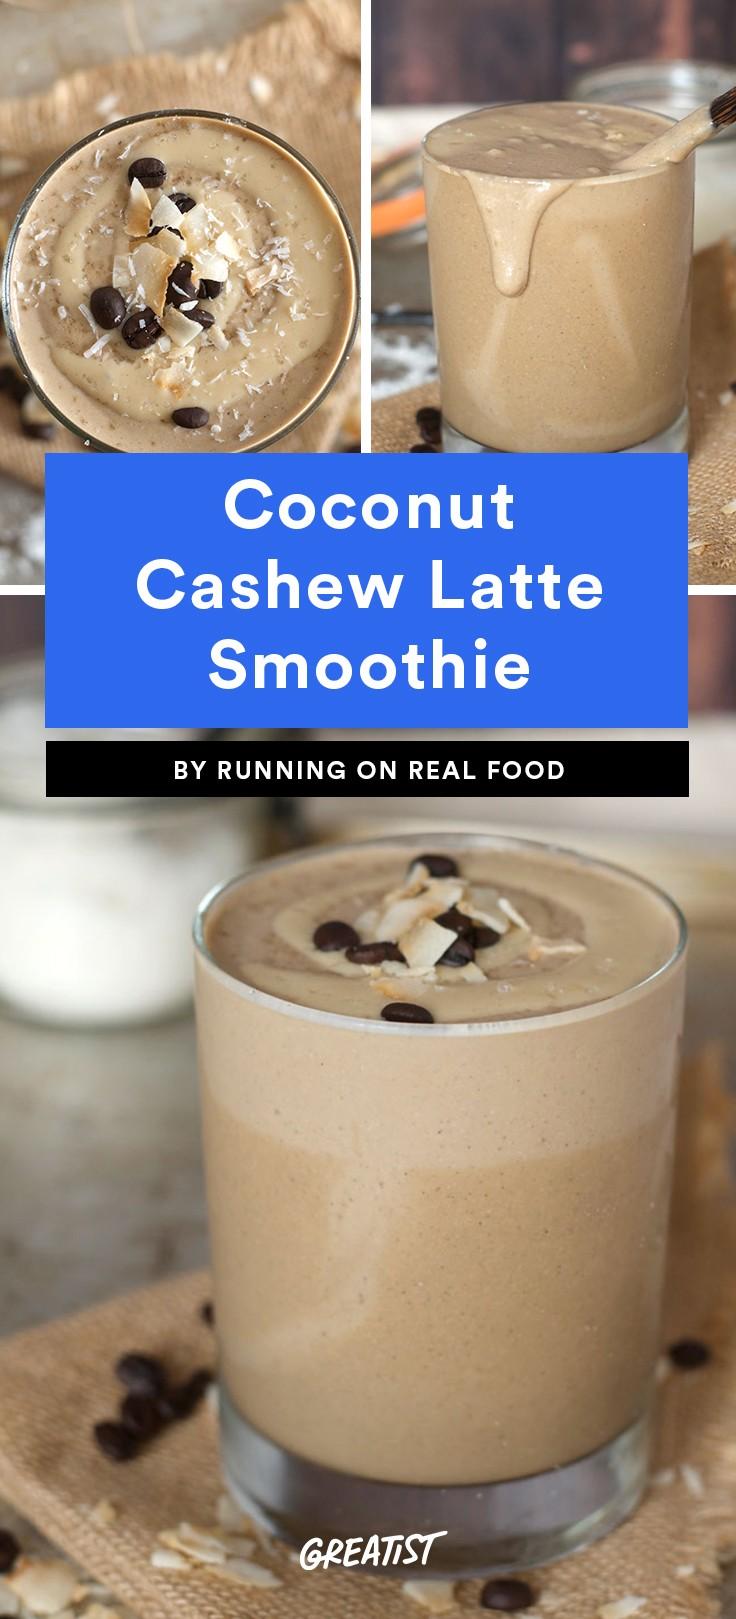 Coconut Cashew Latte Smoothie